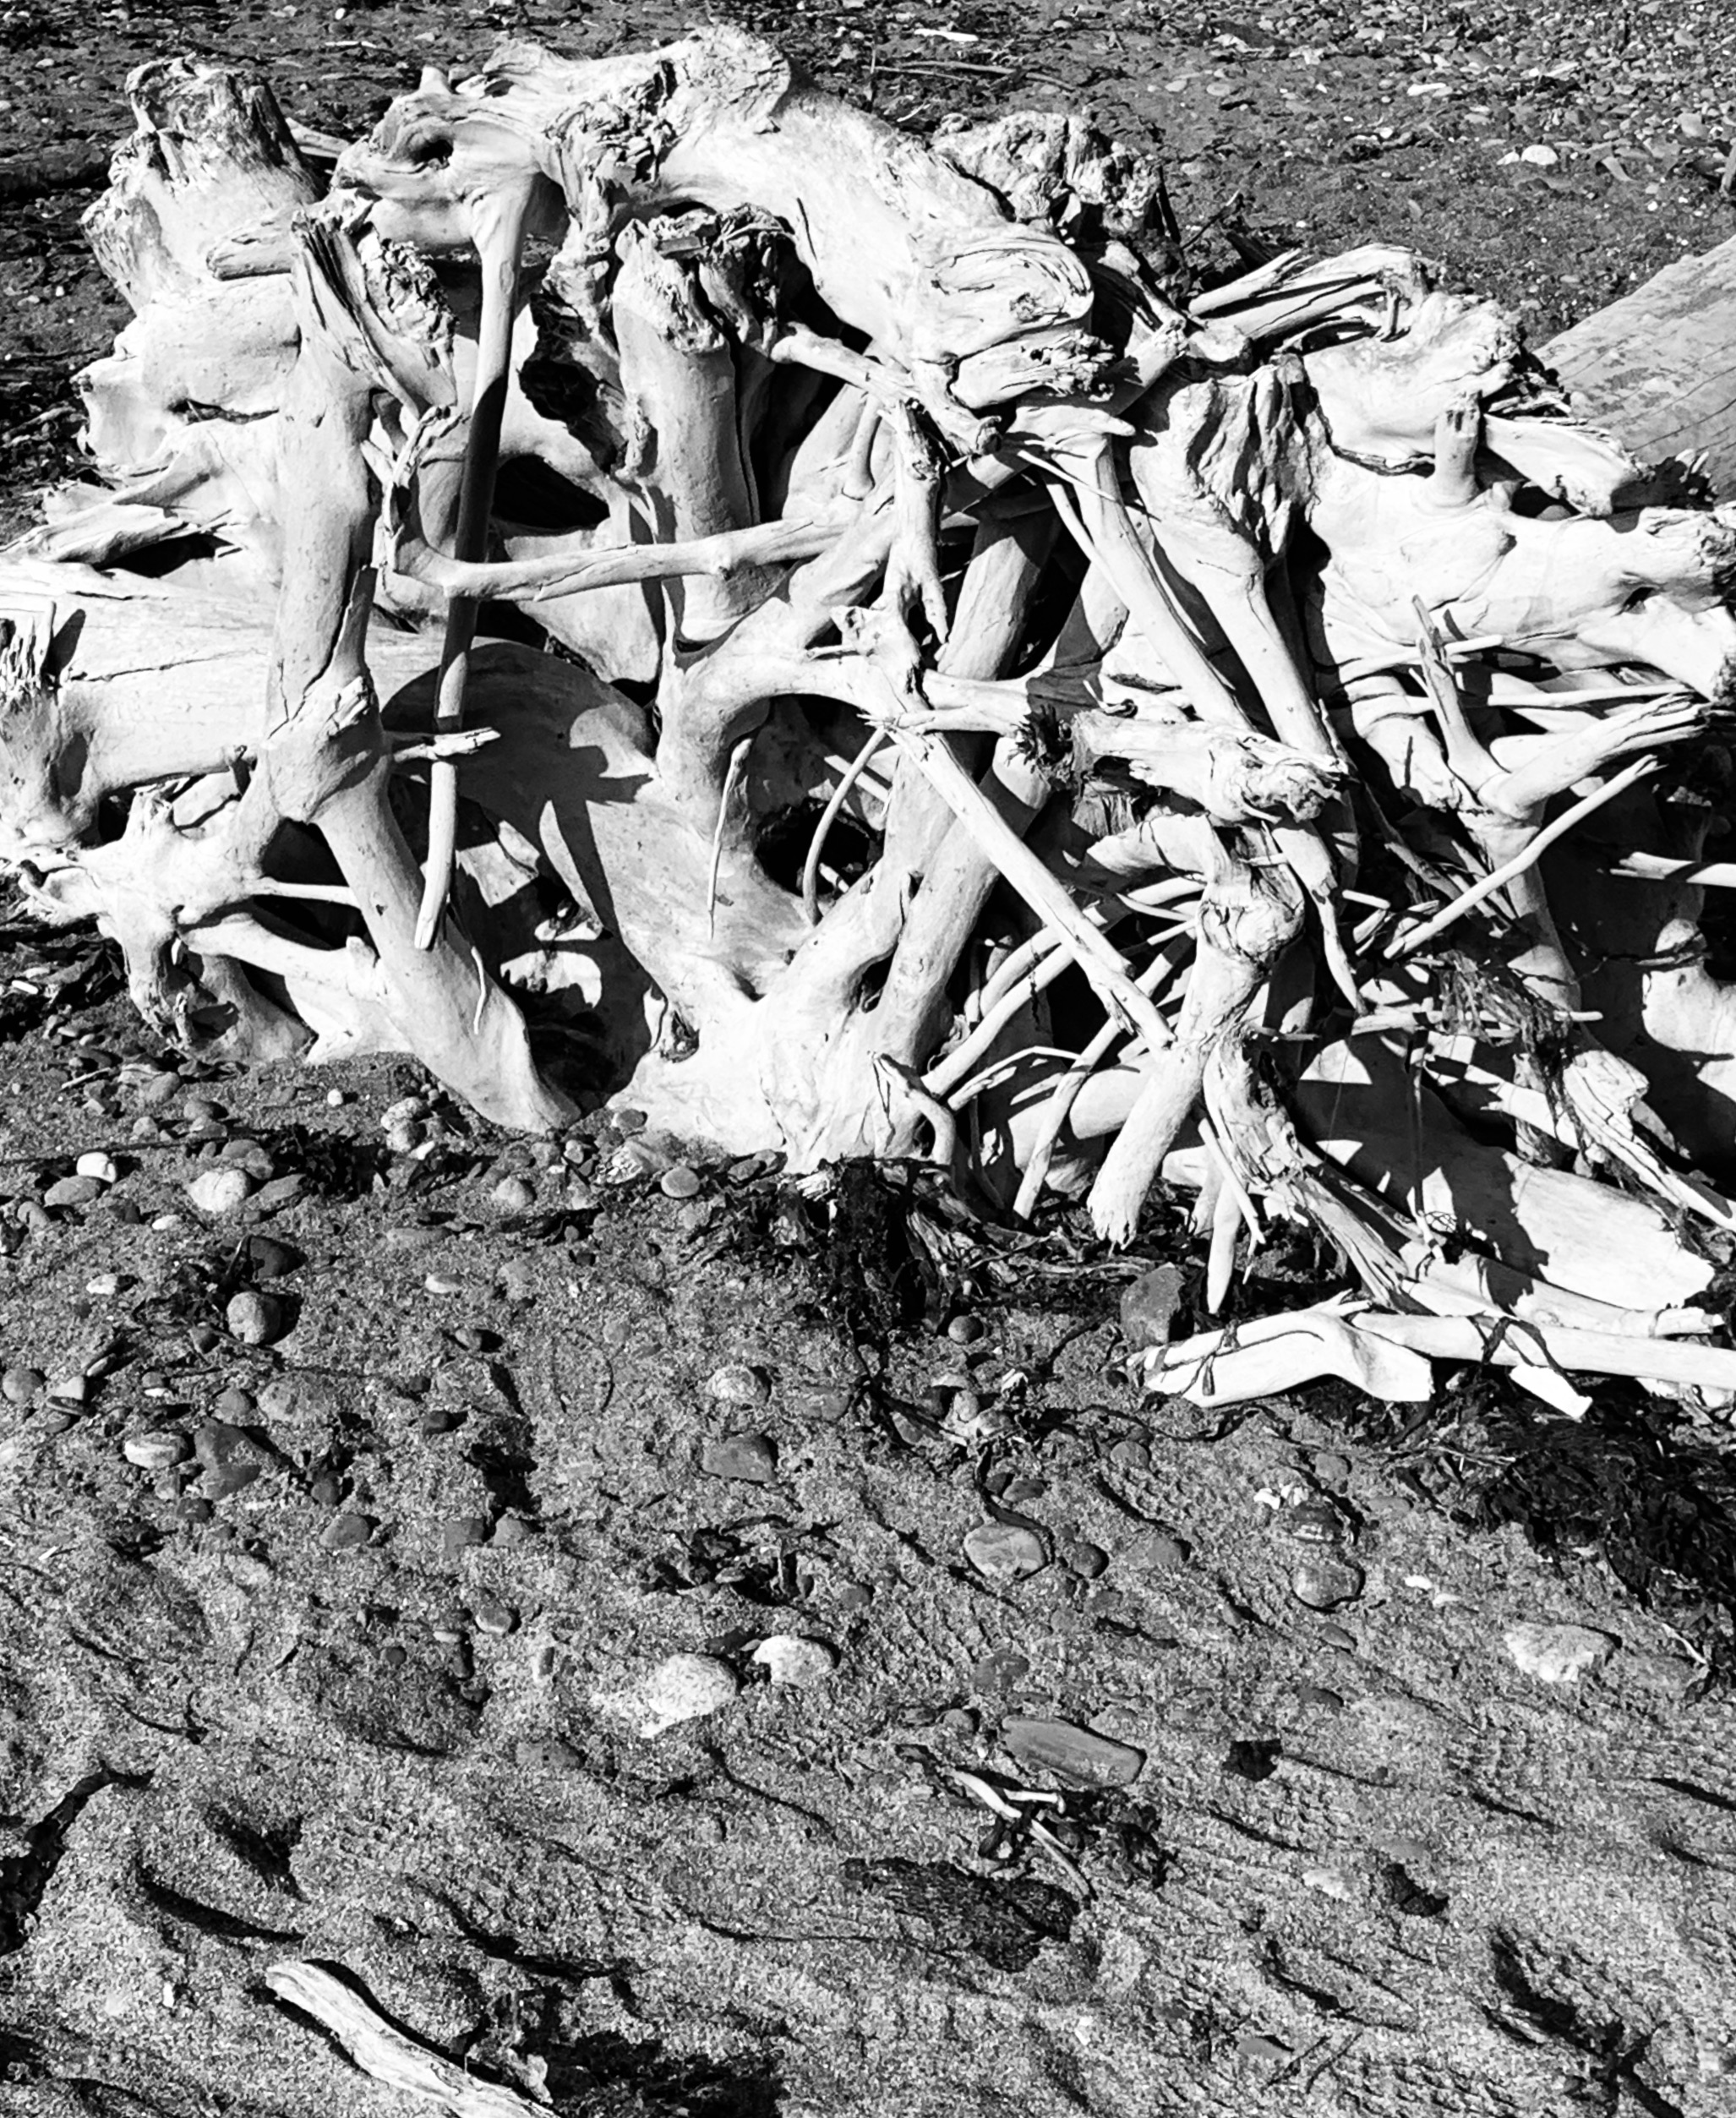 DriftwoodB-WNoir